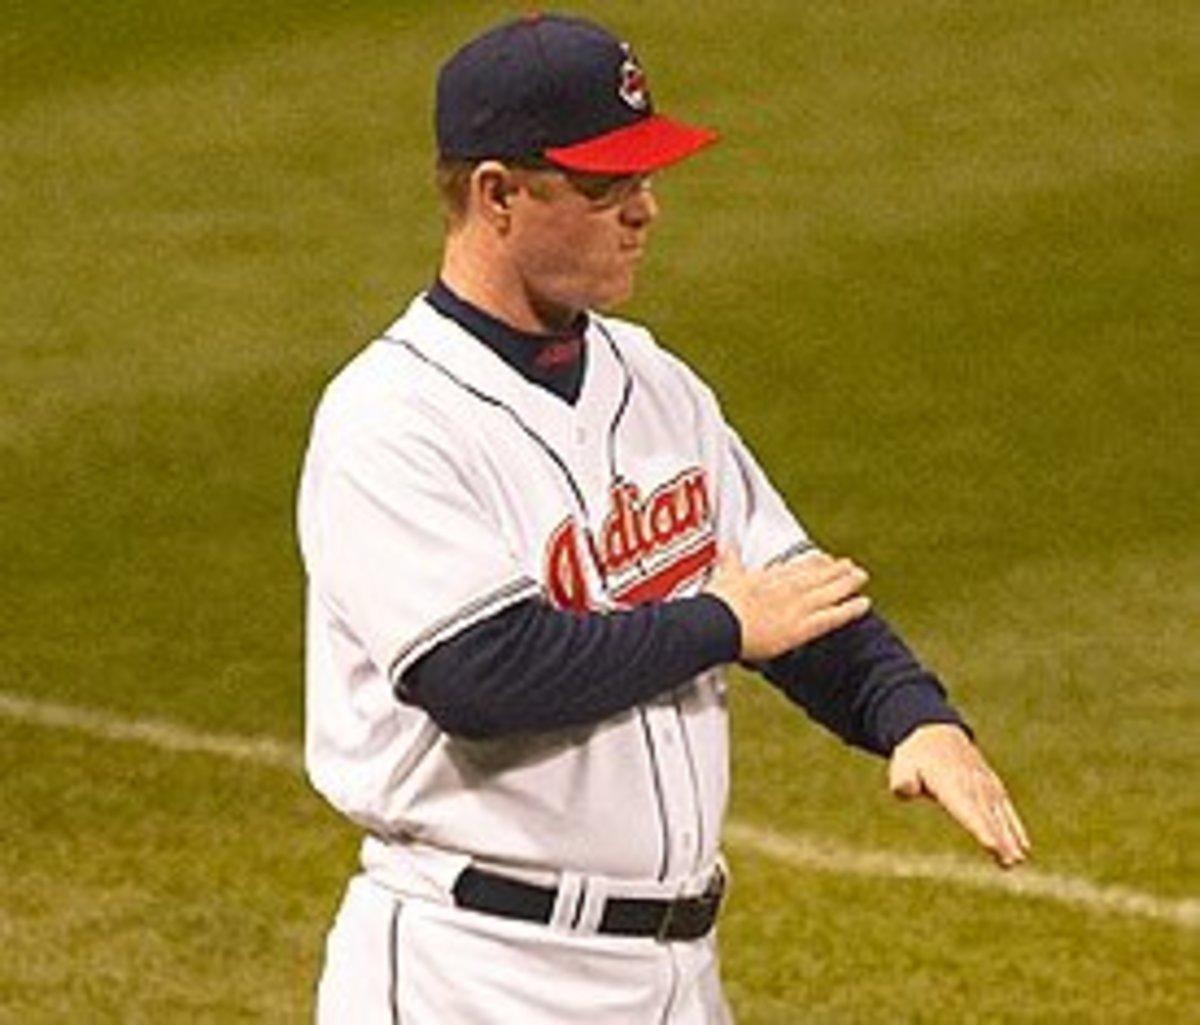 Cleveland Indians Coach Jeff Datz